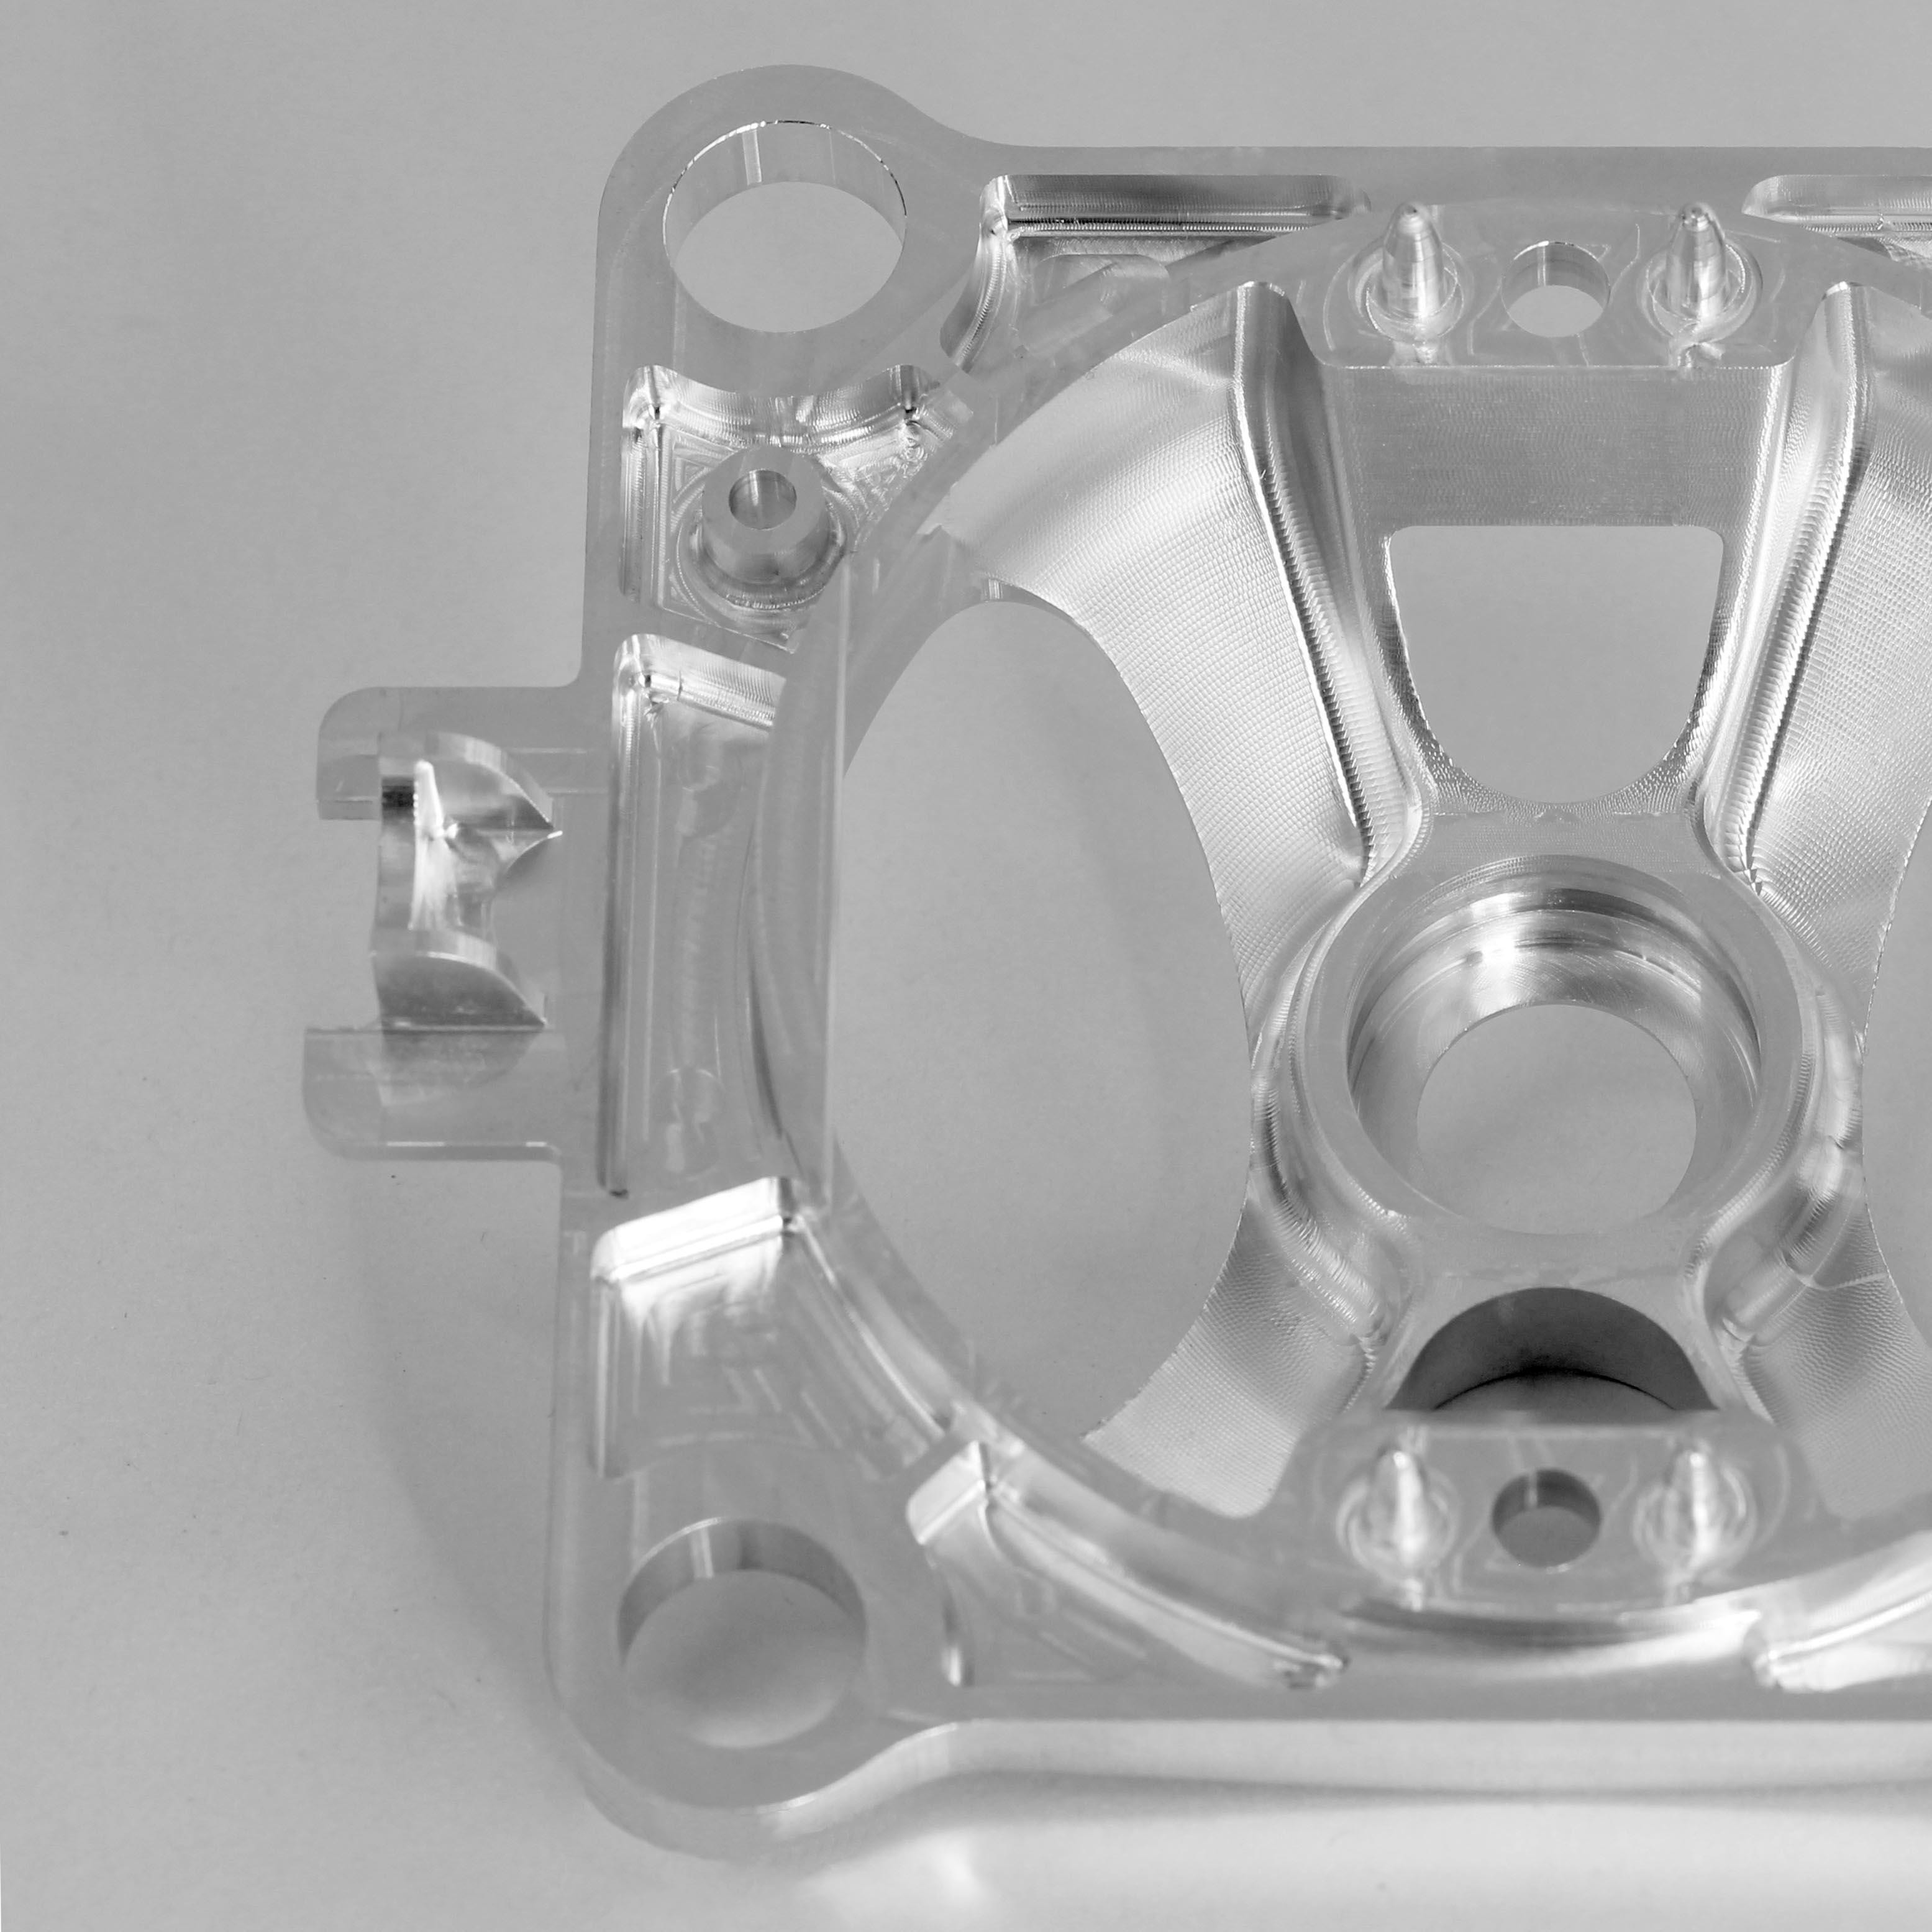 CNC Precision Machining Services